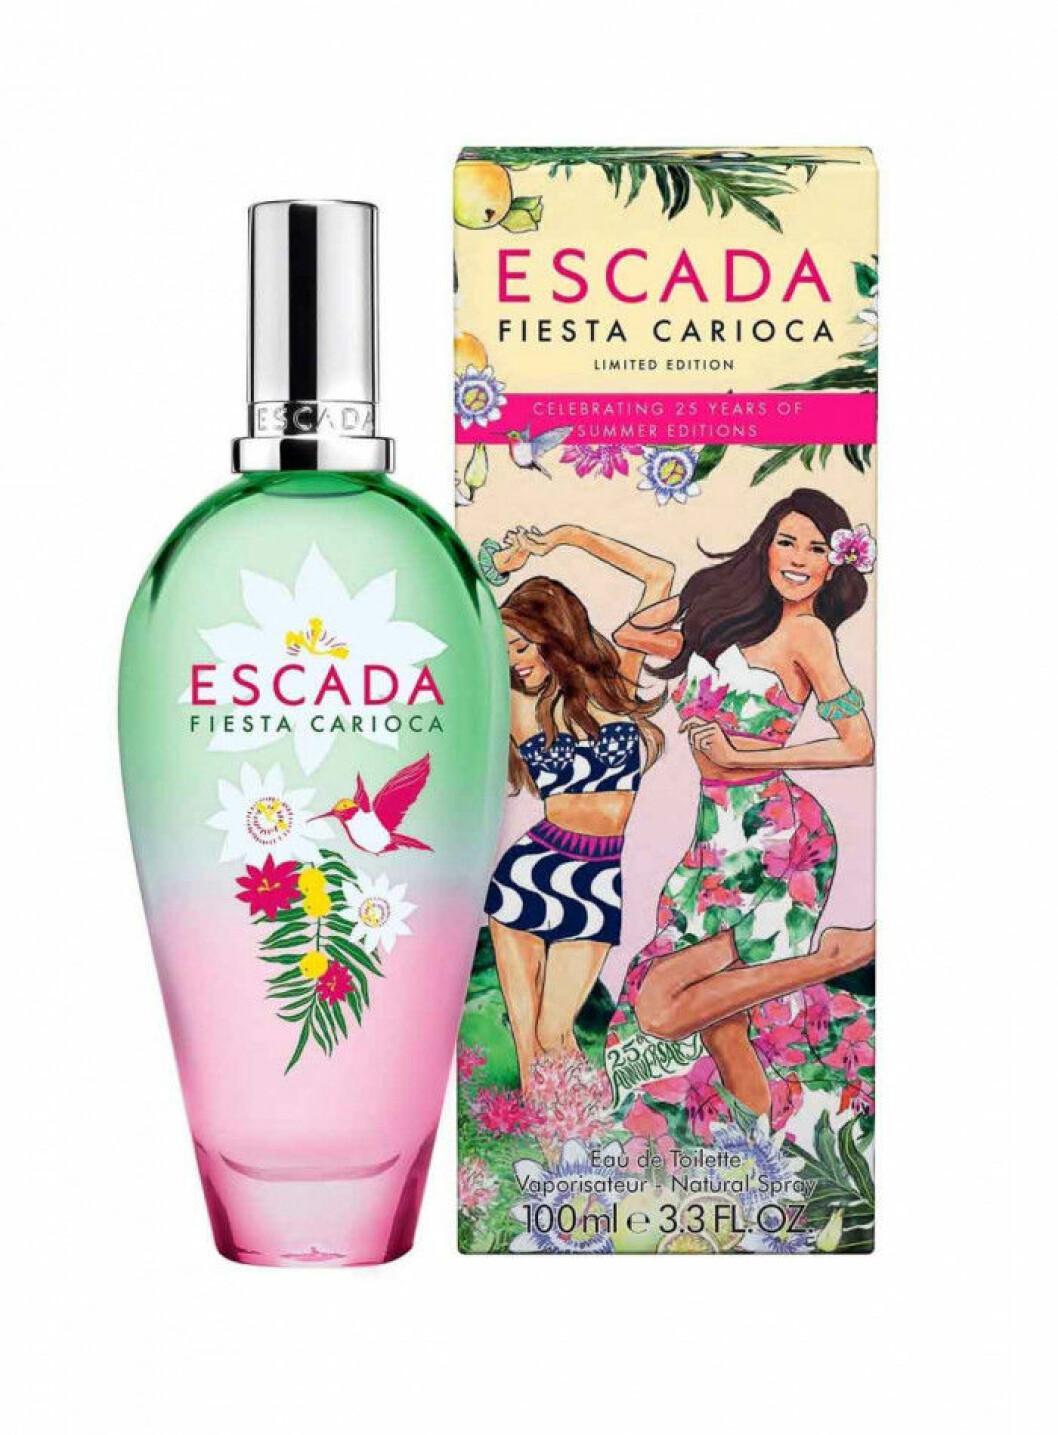 Fiesta-carioca-Escada